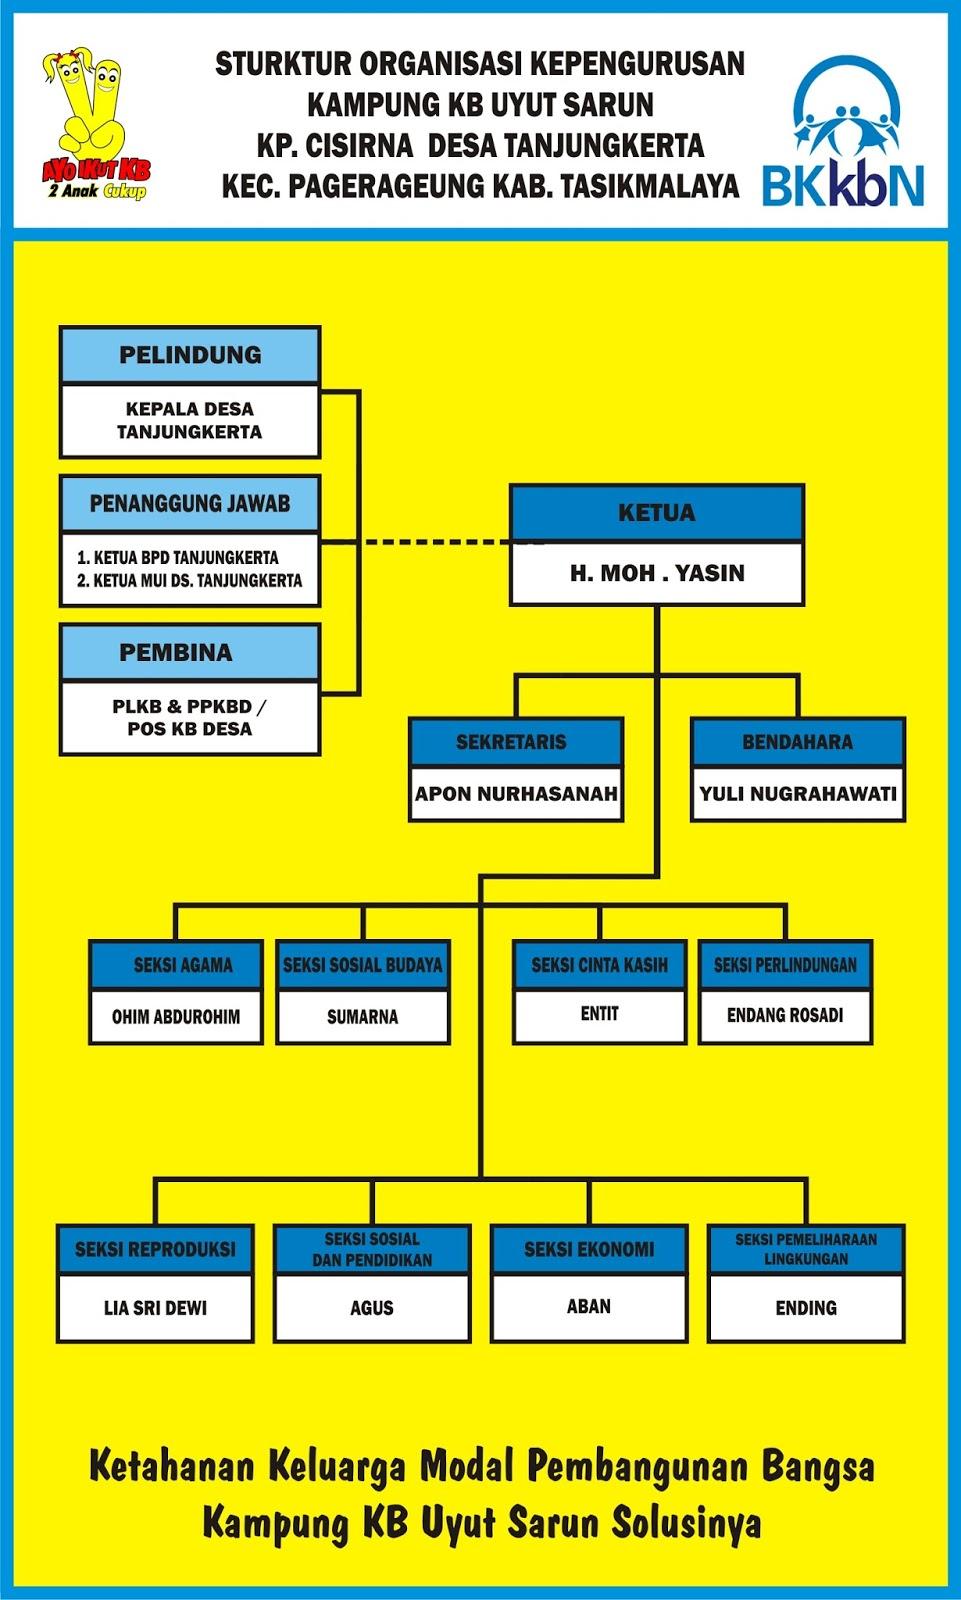 Download Desain Struktur Organisasi Cdr : download, desain, struktur, organisasi, Download, Contoh, Struktur, Organisasi, Kampung, KB.cdr, KARYAKU